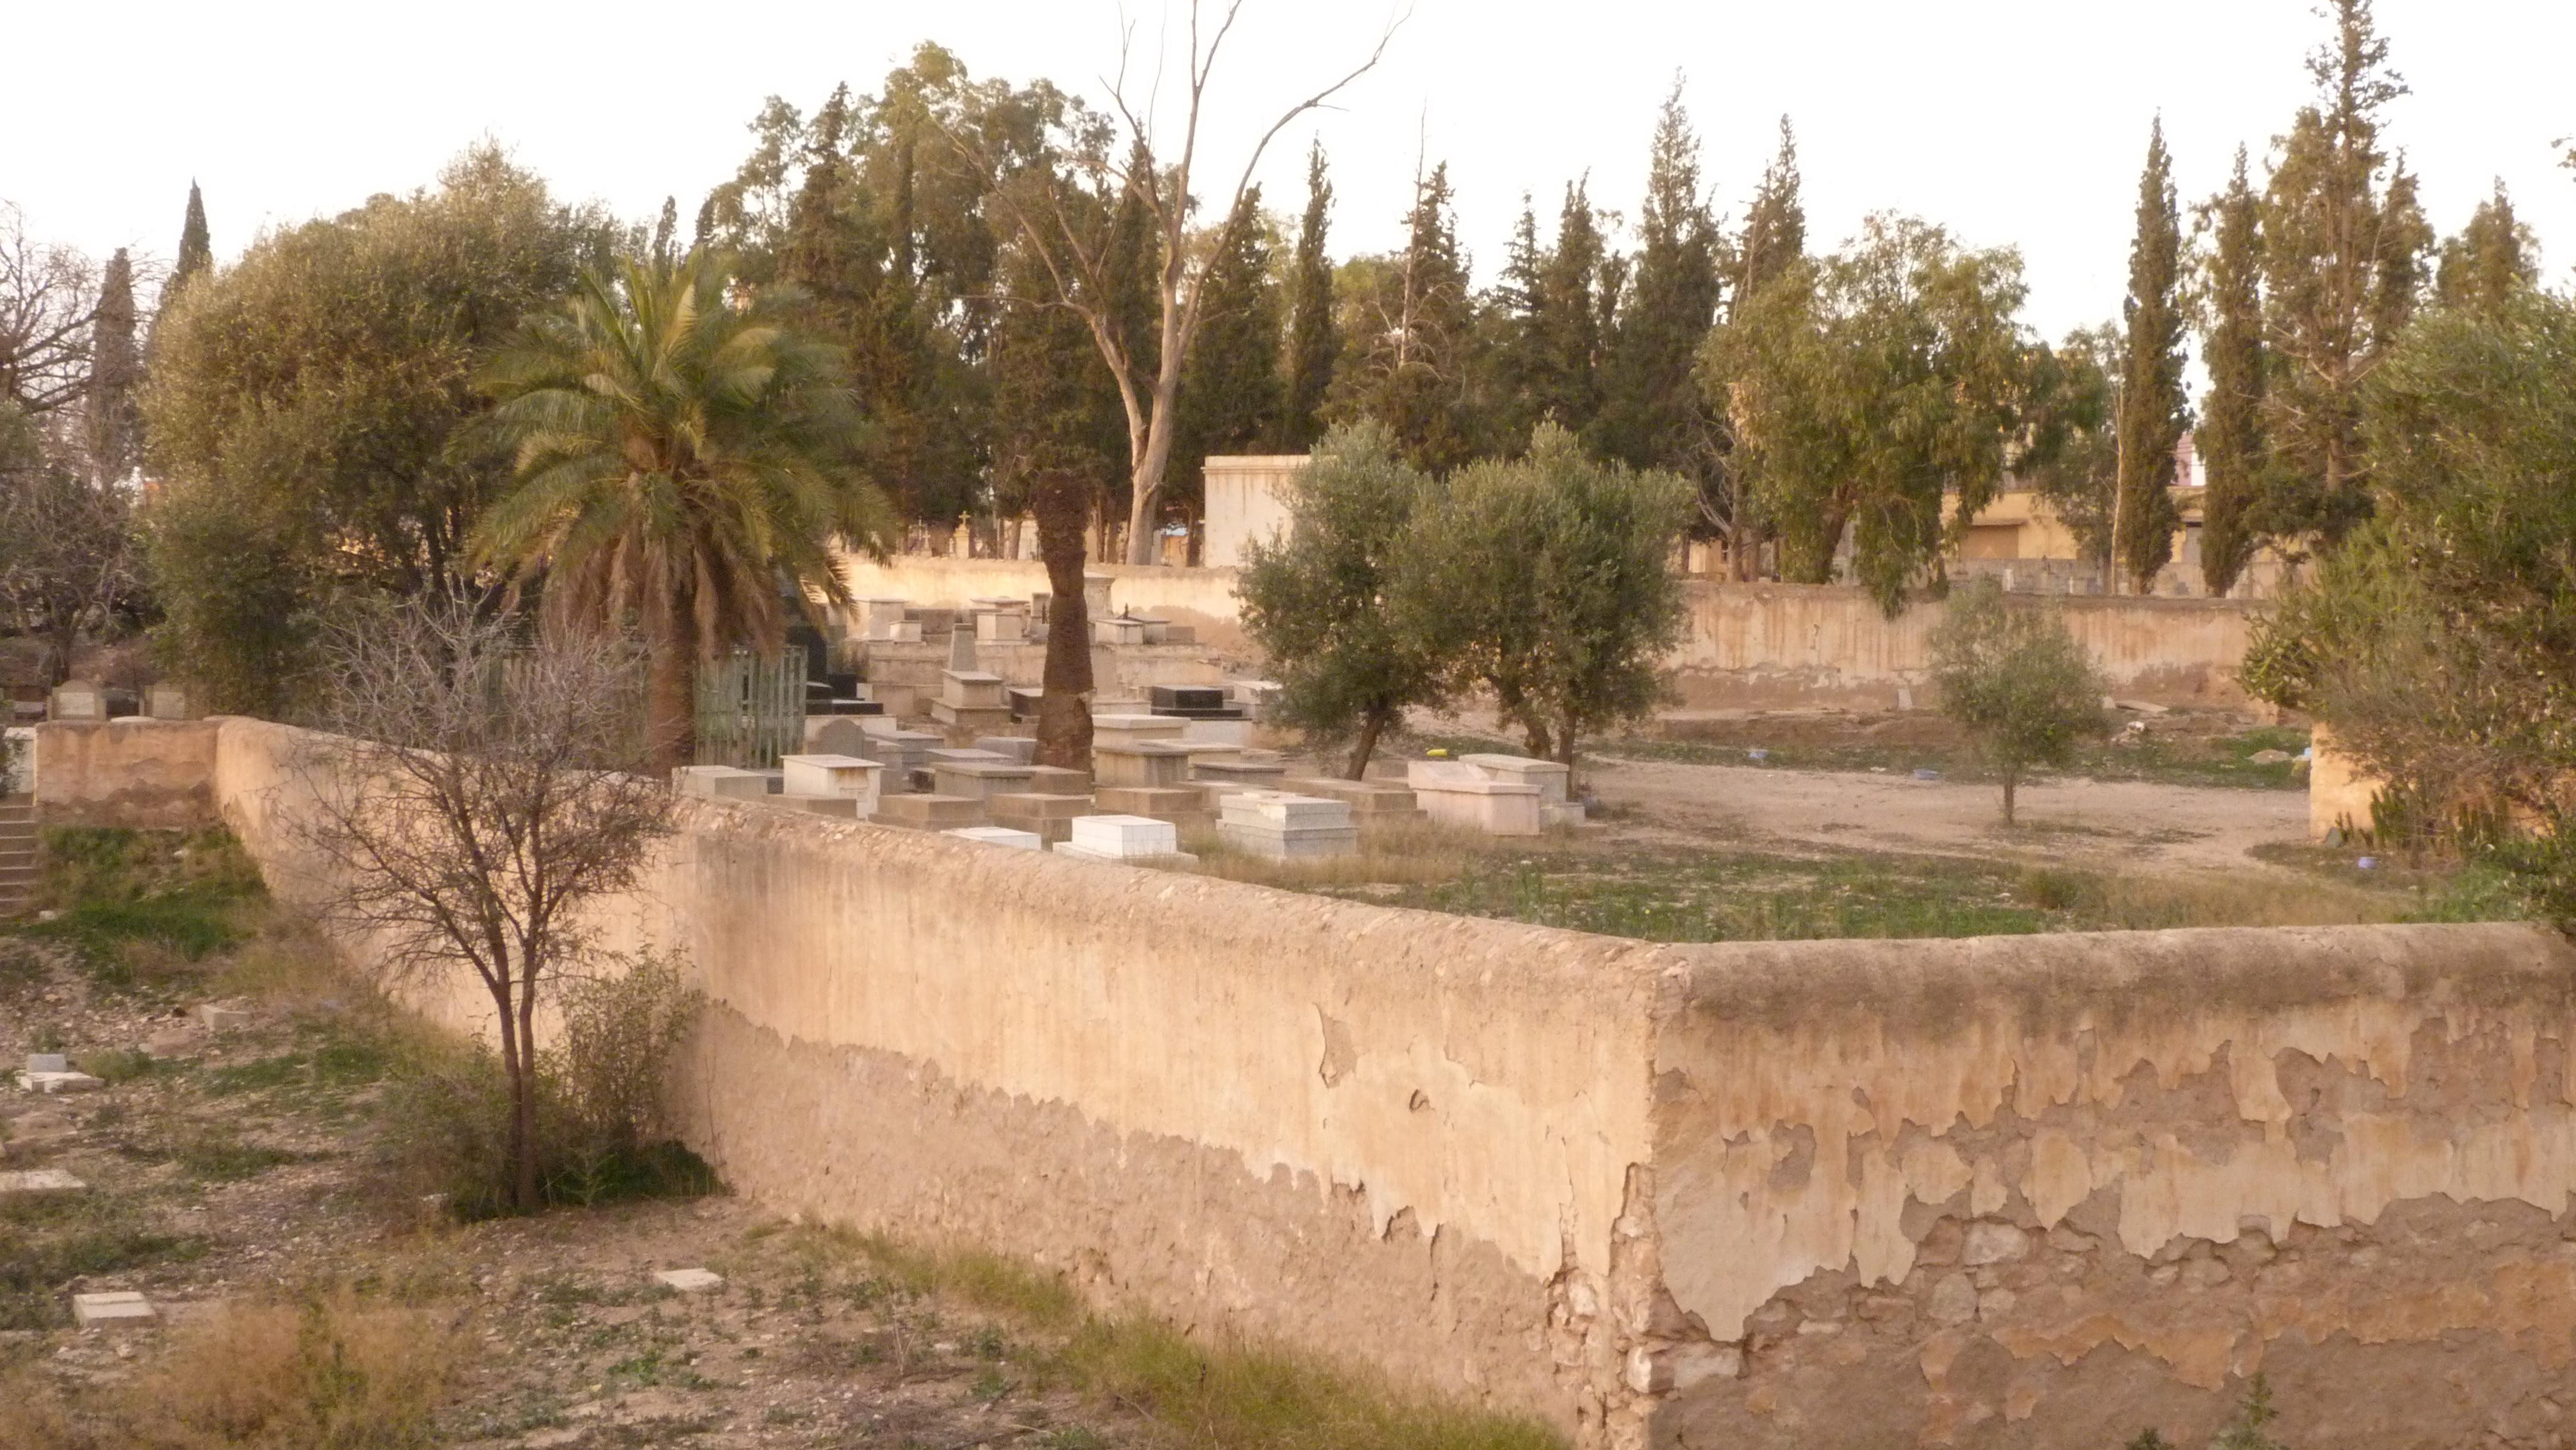 the Jewish Cemetery in Oujda, Morocco                        courtesy Wikimedia